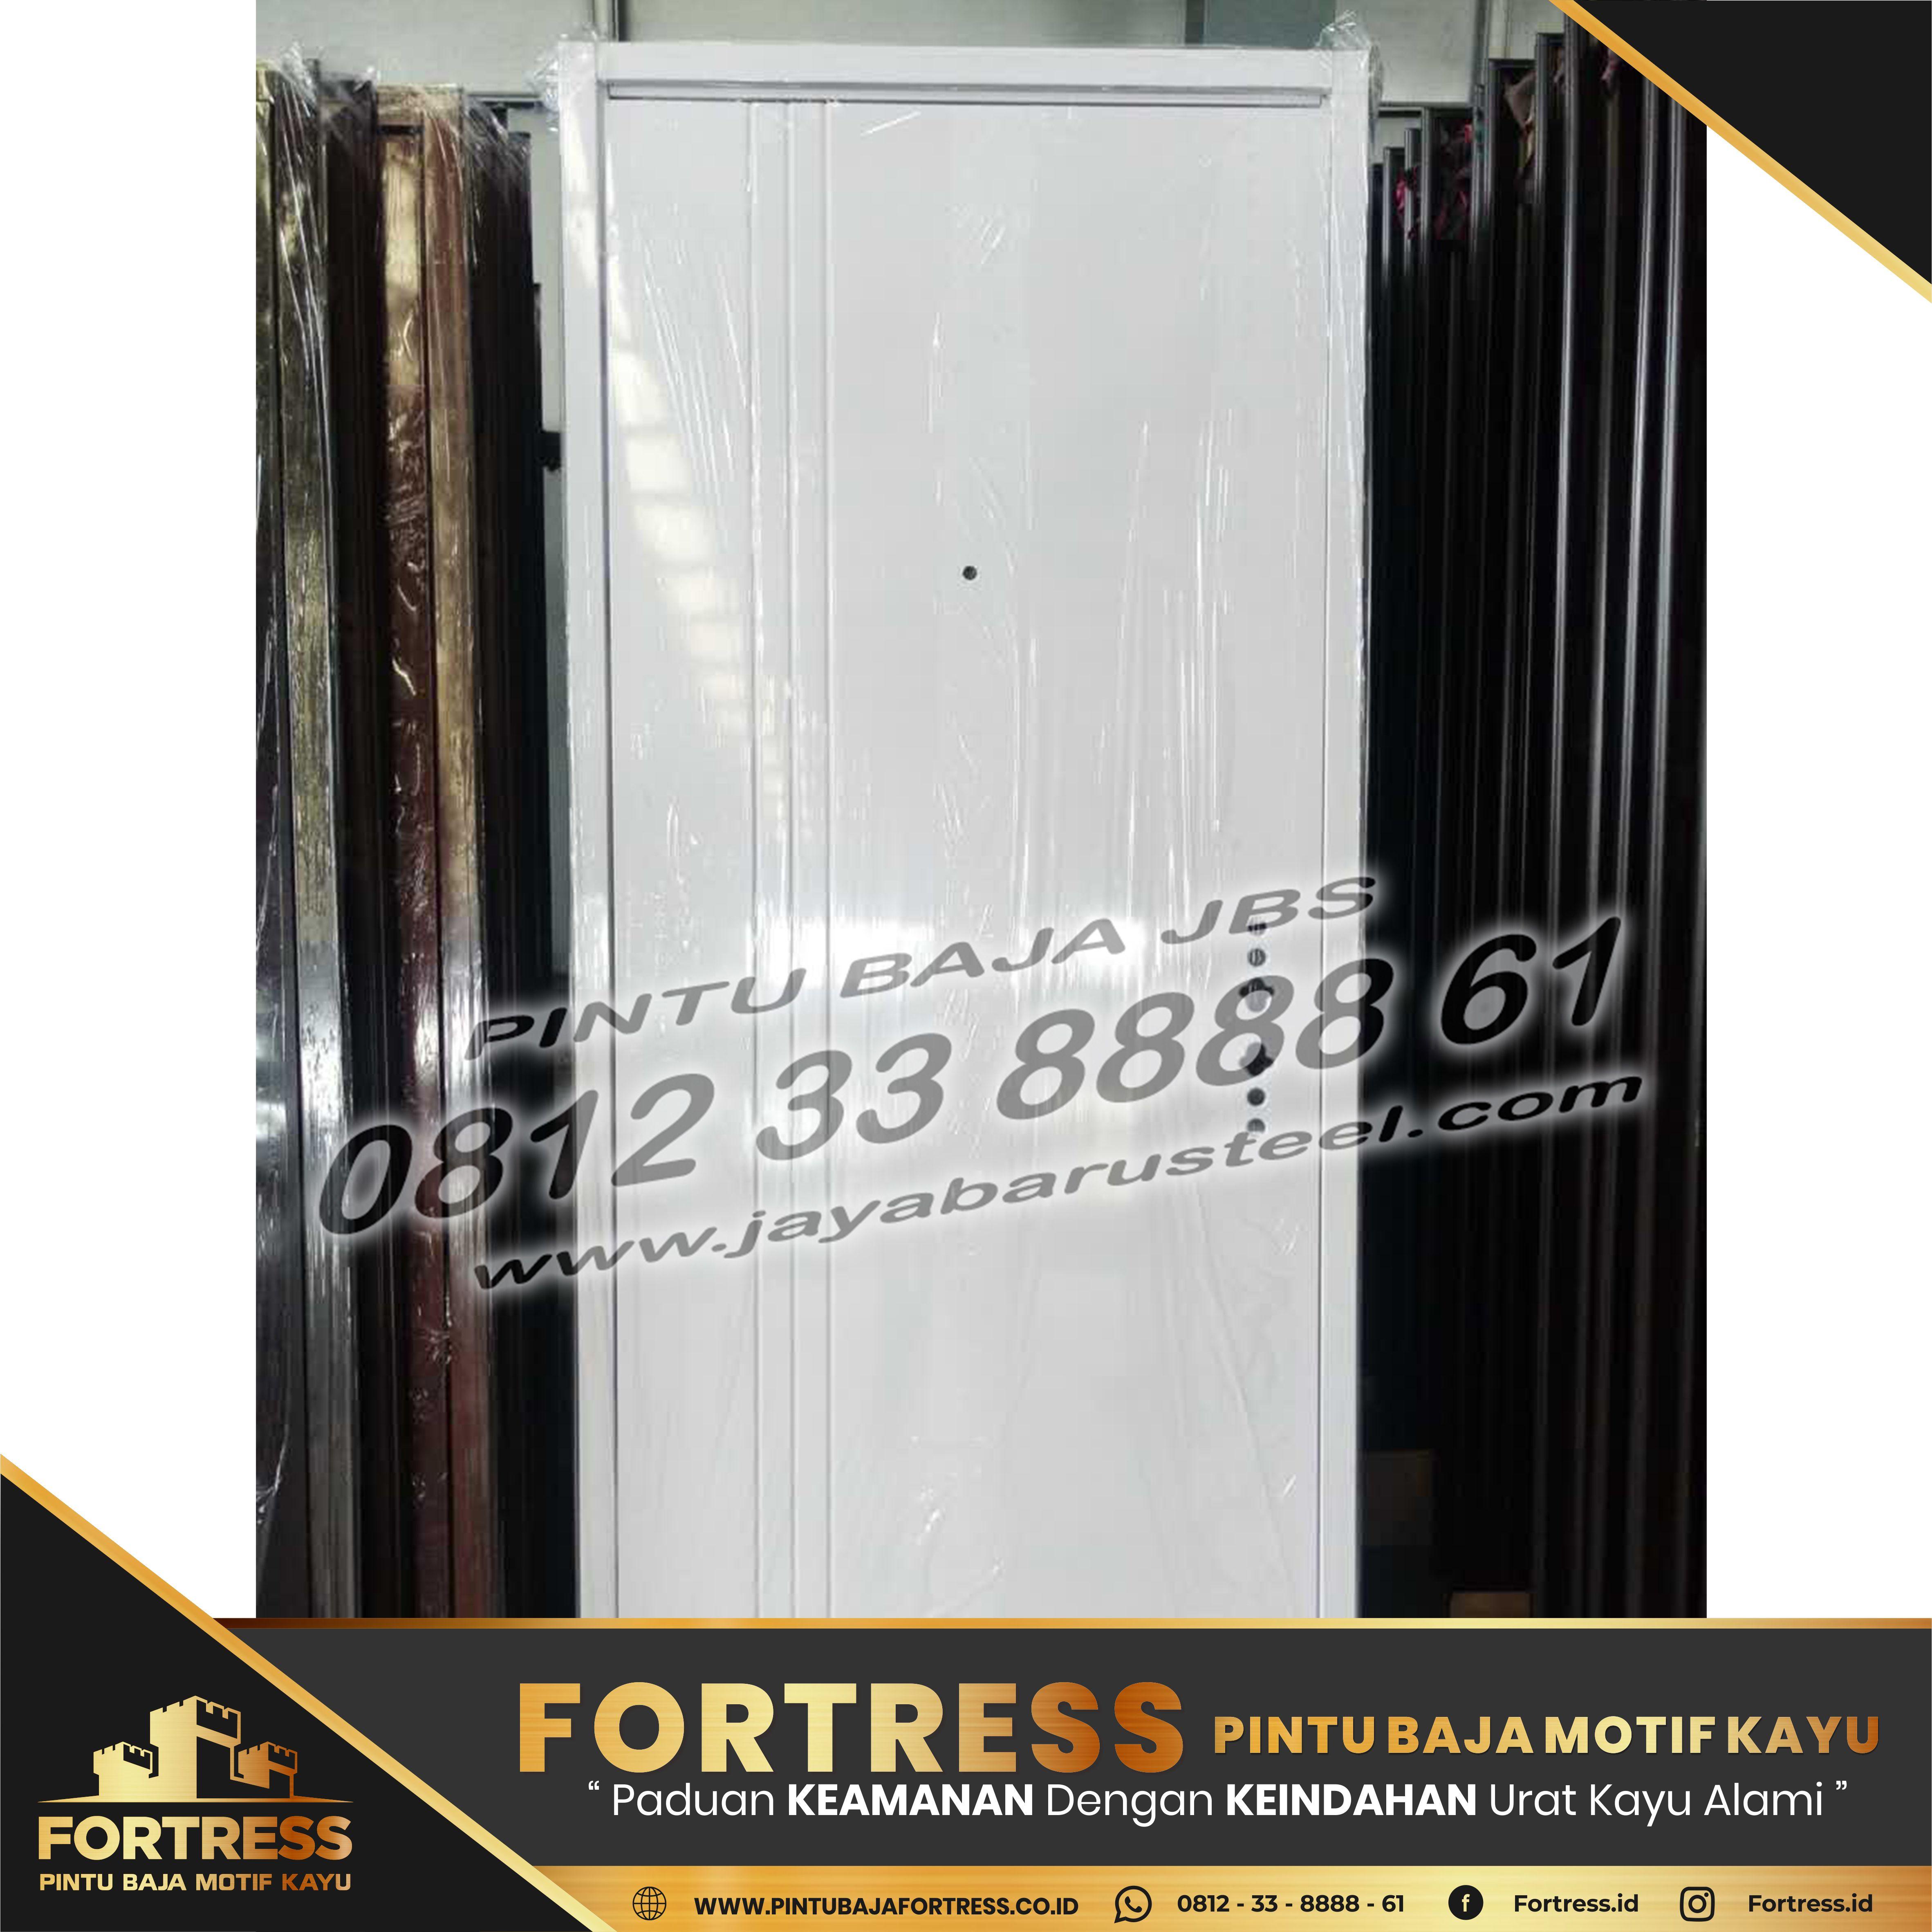 0812-91-6261-07 (FORTRESS) Banjar Masin Steel Plate Door, Pi …